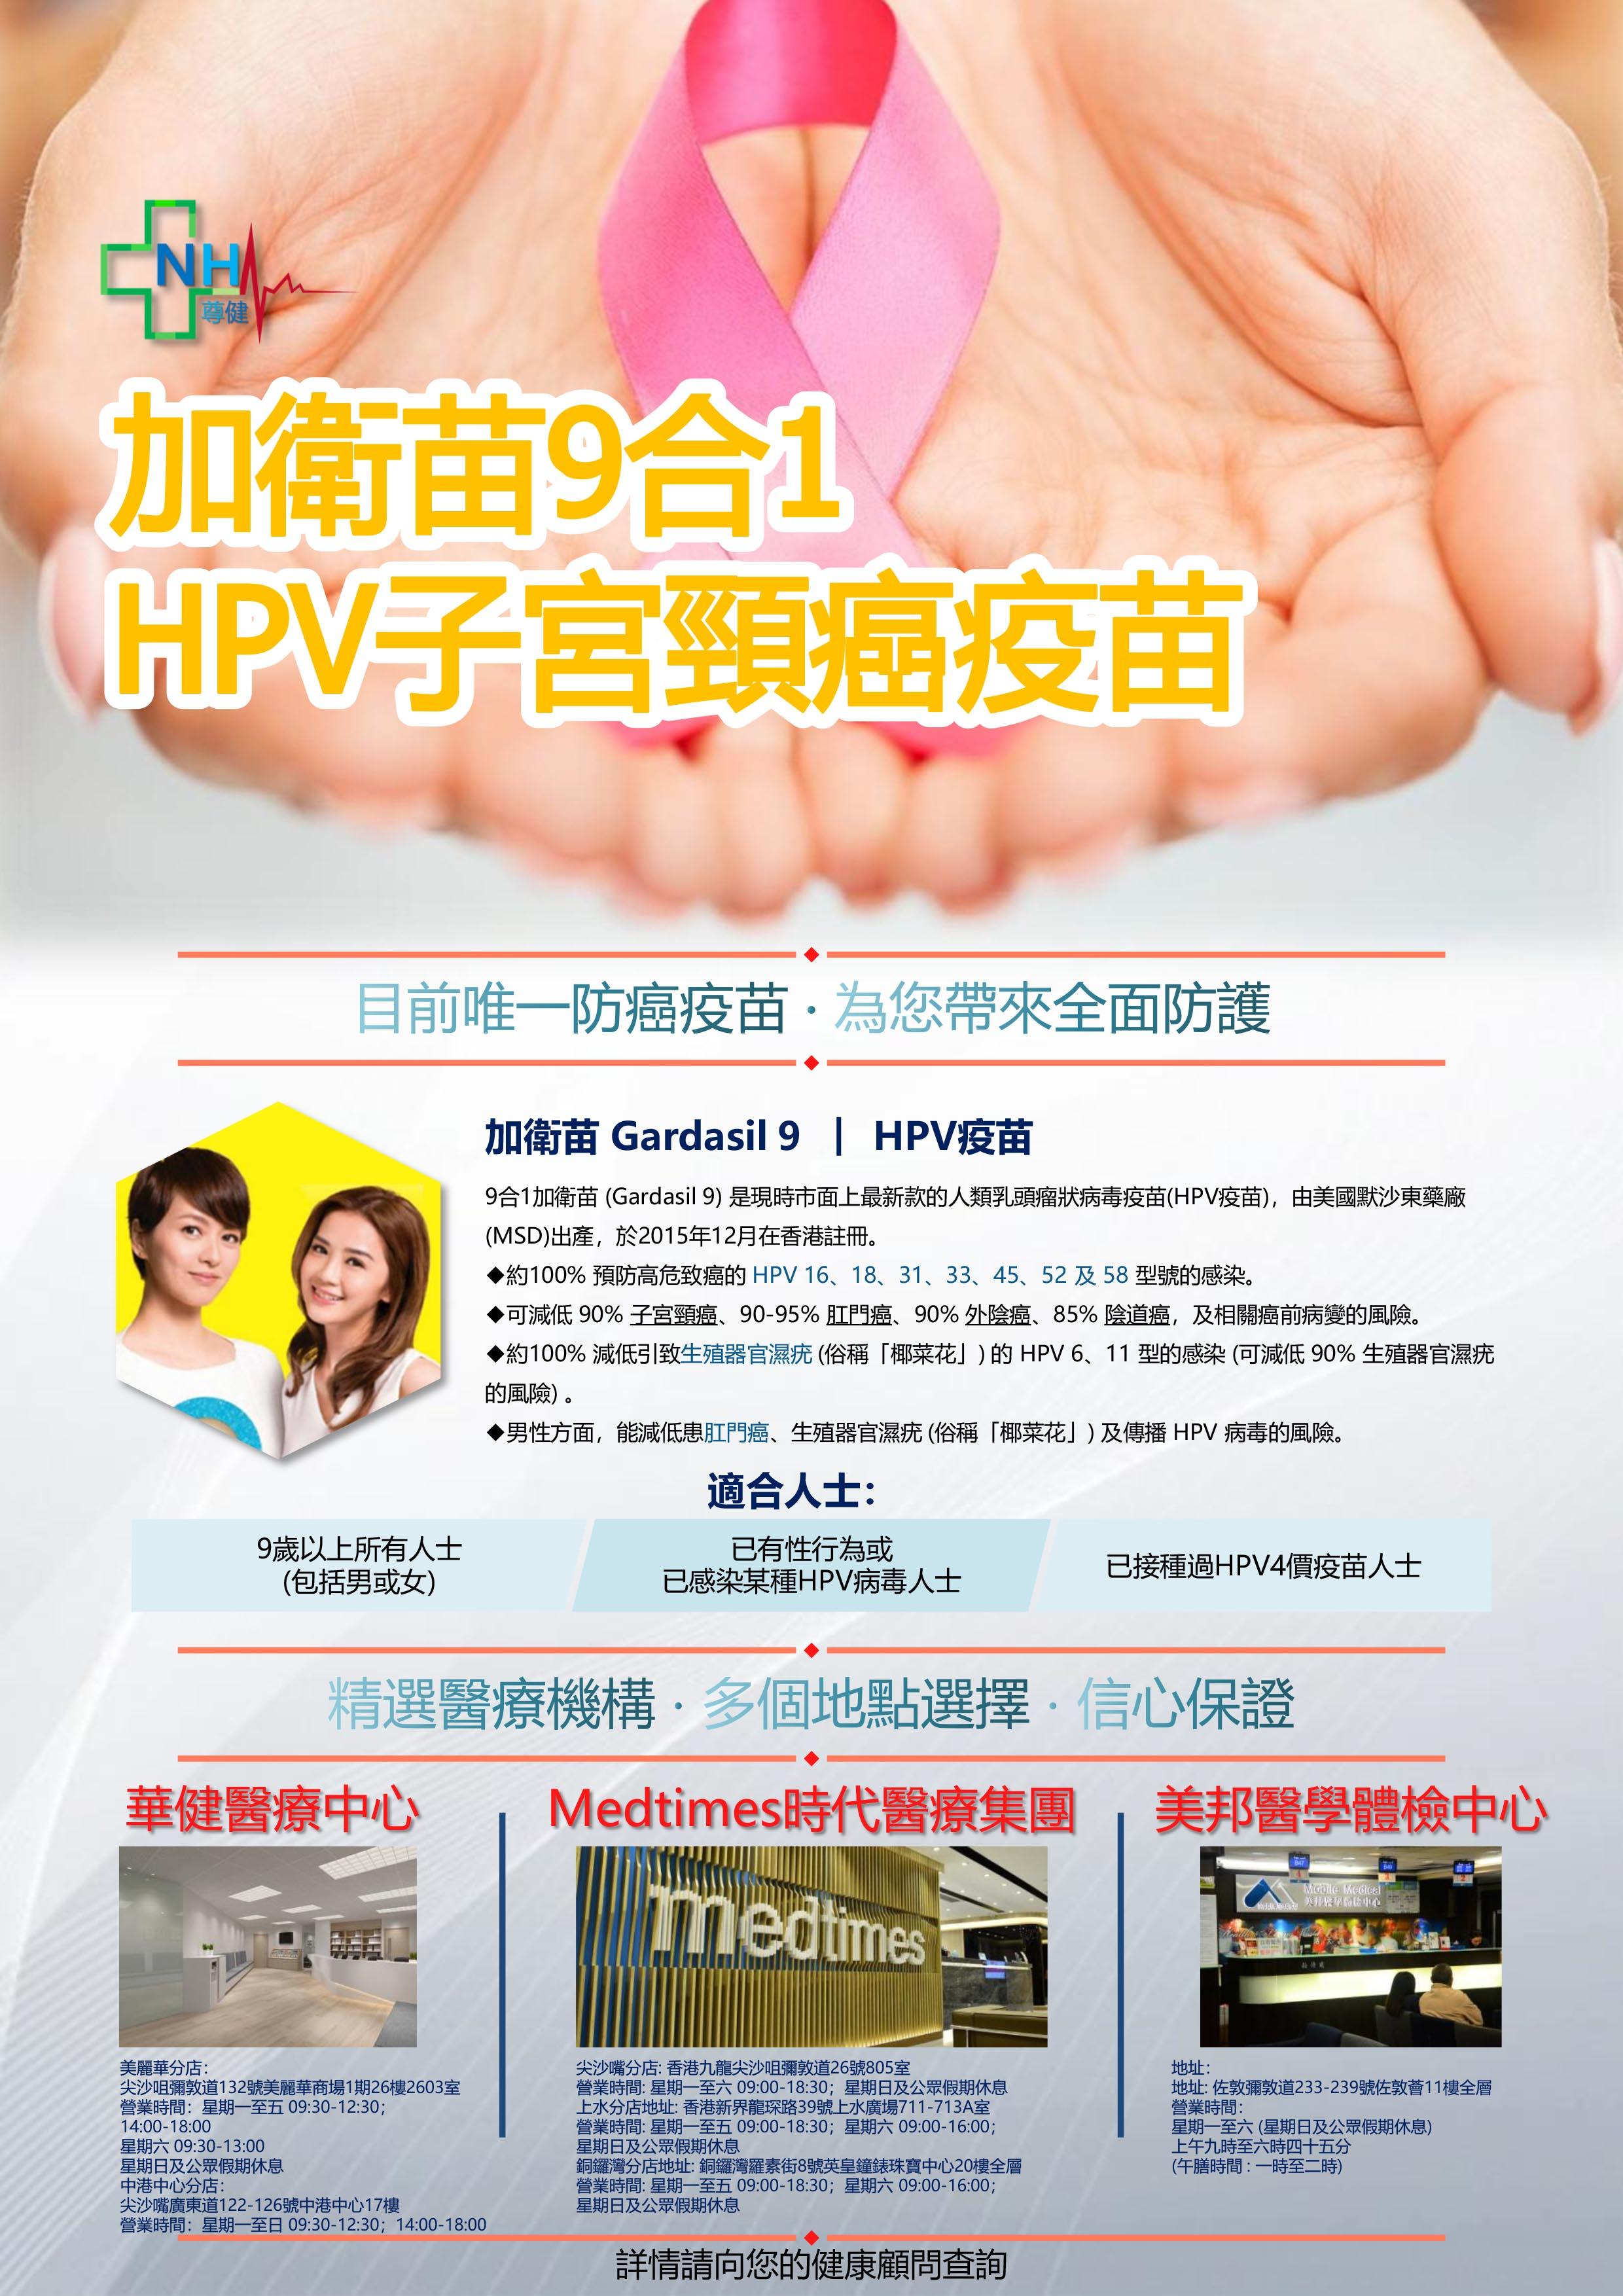 hpv-vaccain.jpg